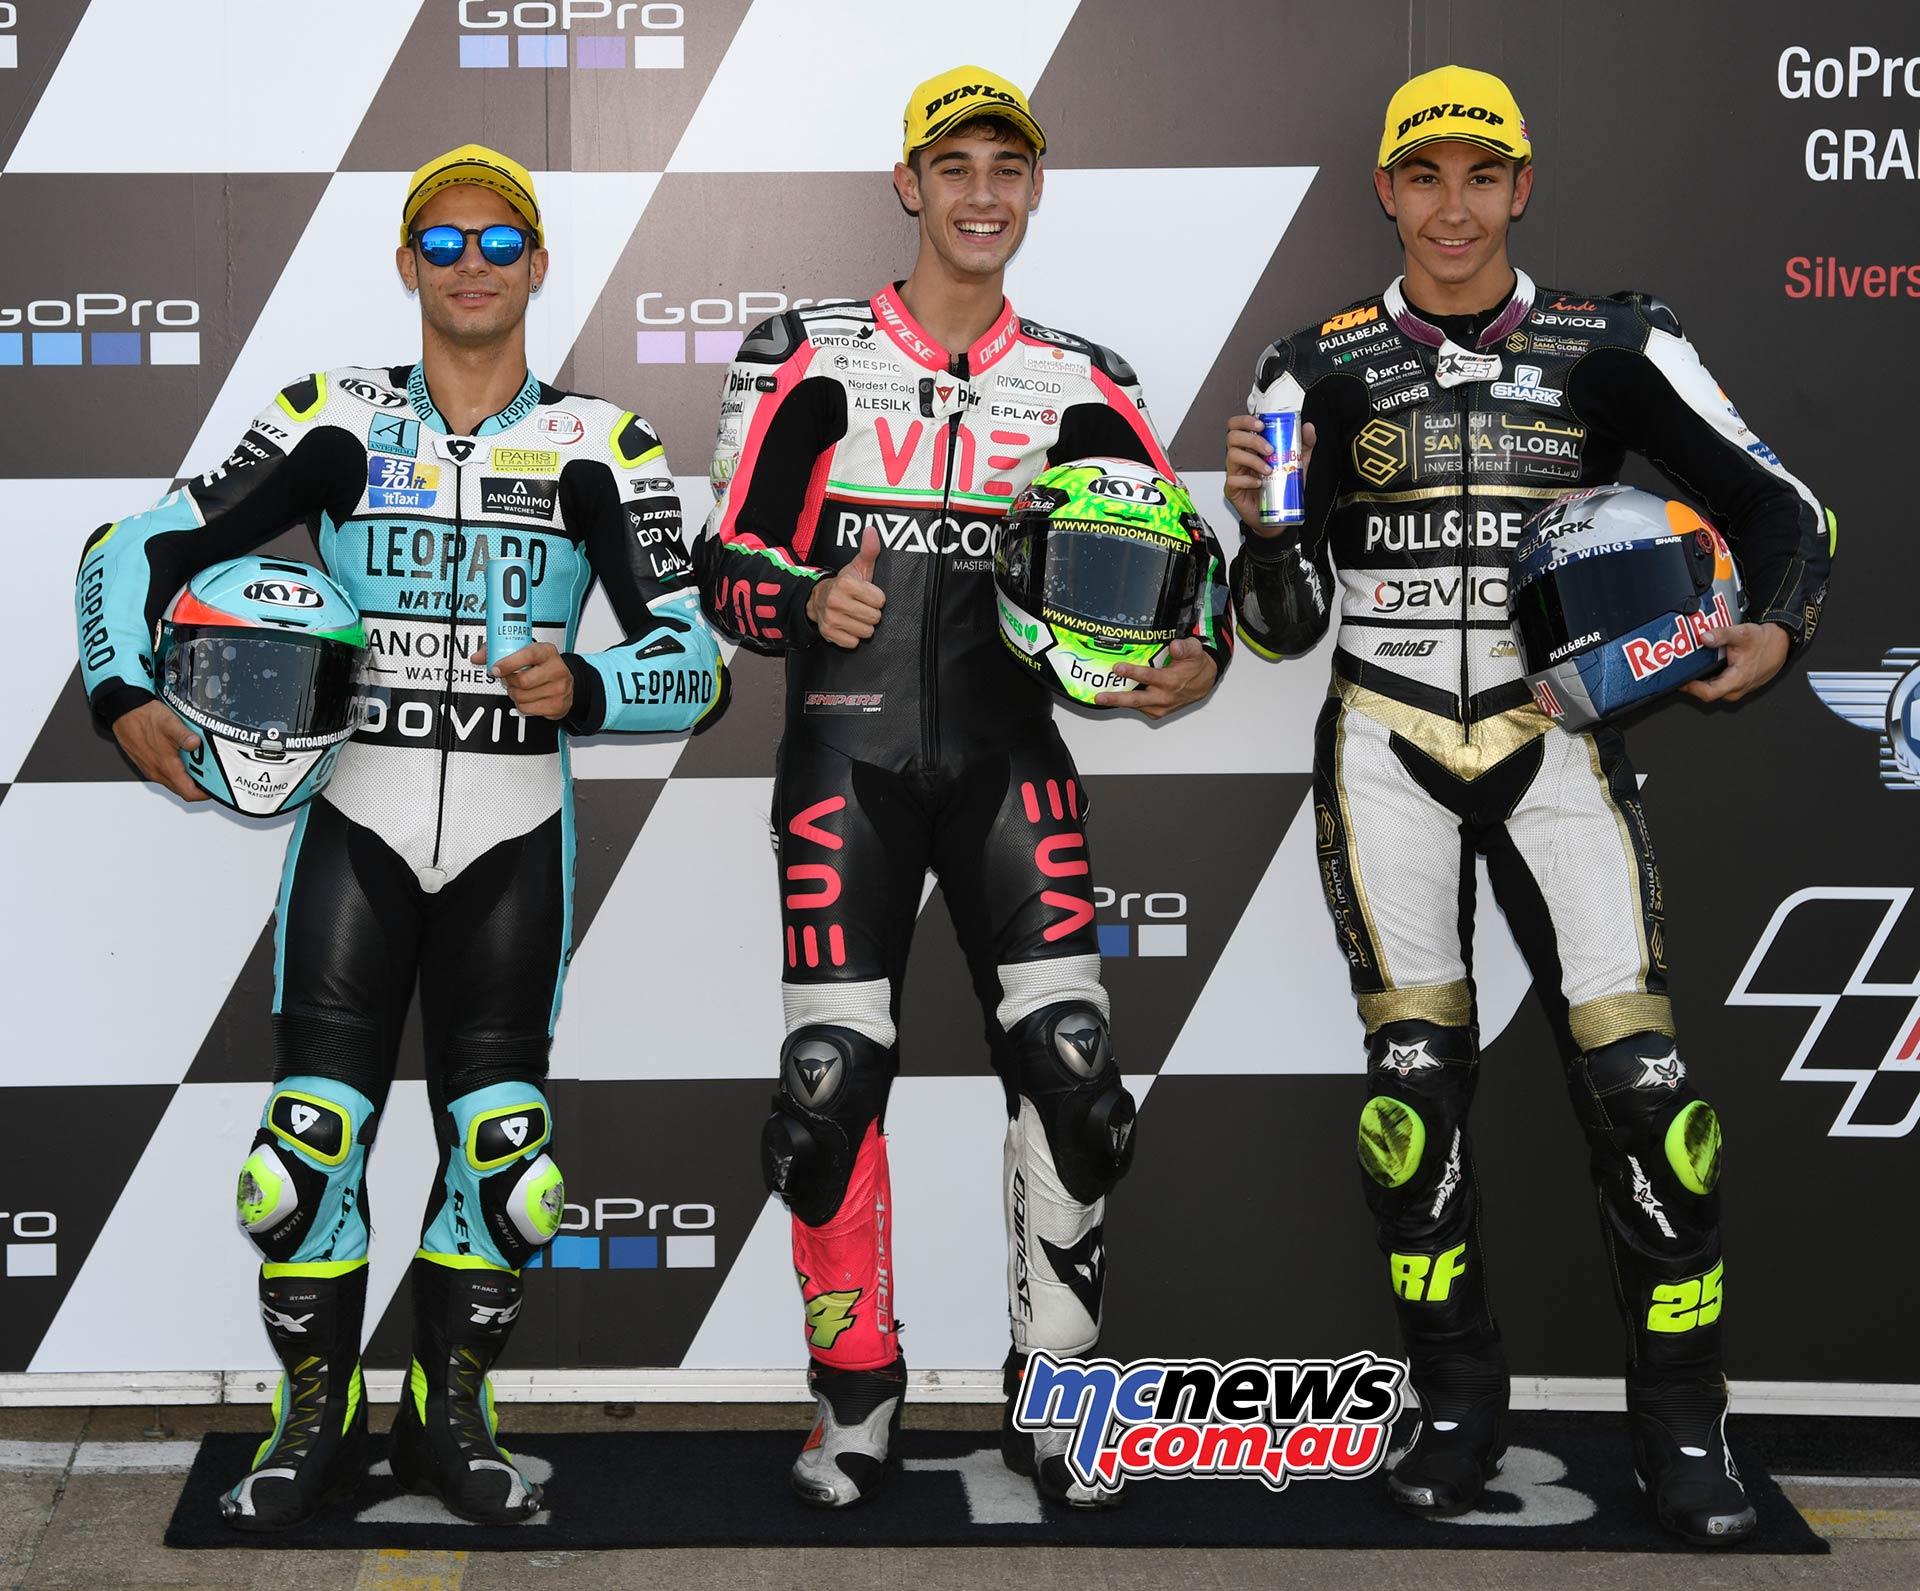 MotoGP Rnd Silverstone QP Moto Pole Tony Arbolino